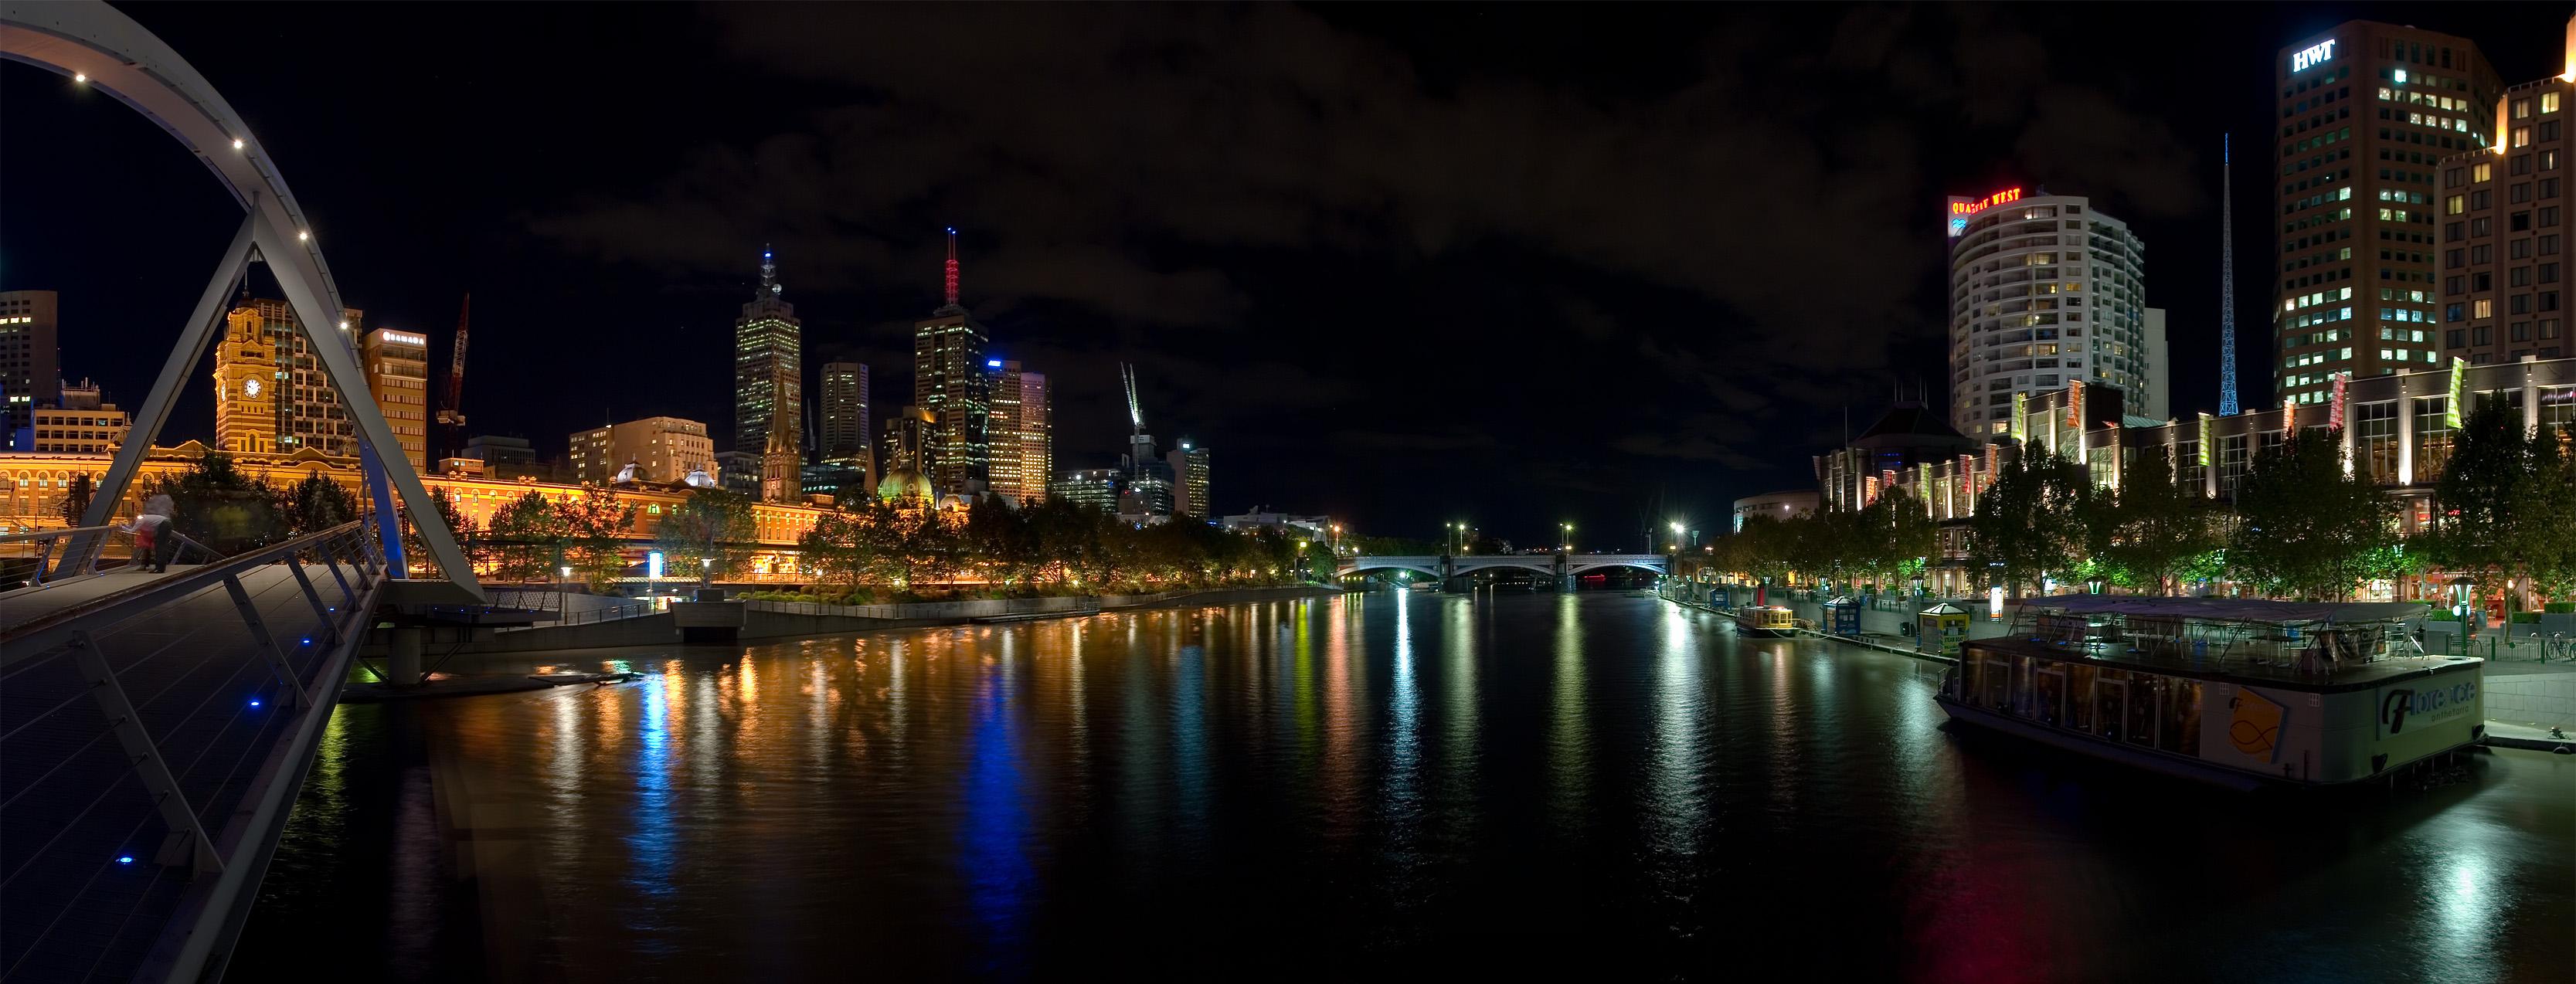 Yarra_Night_Panorama,_Melbourne_-_Feb_20